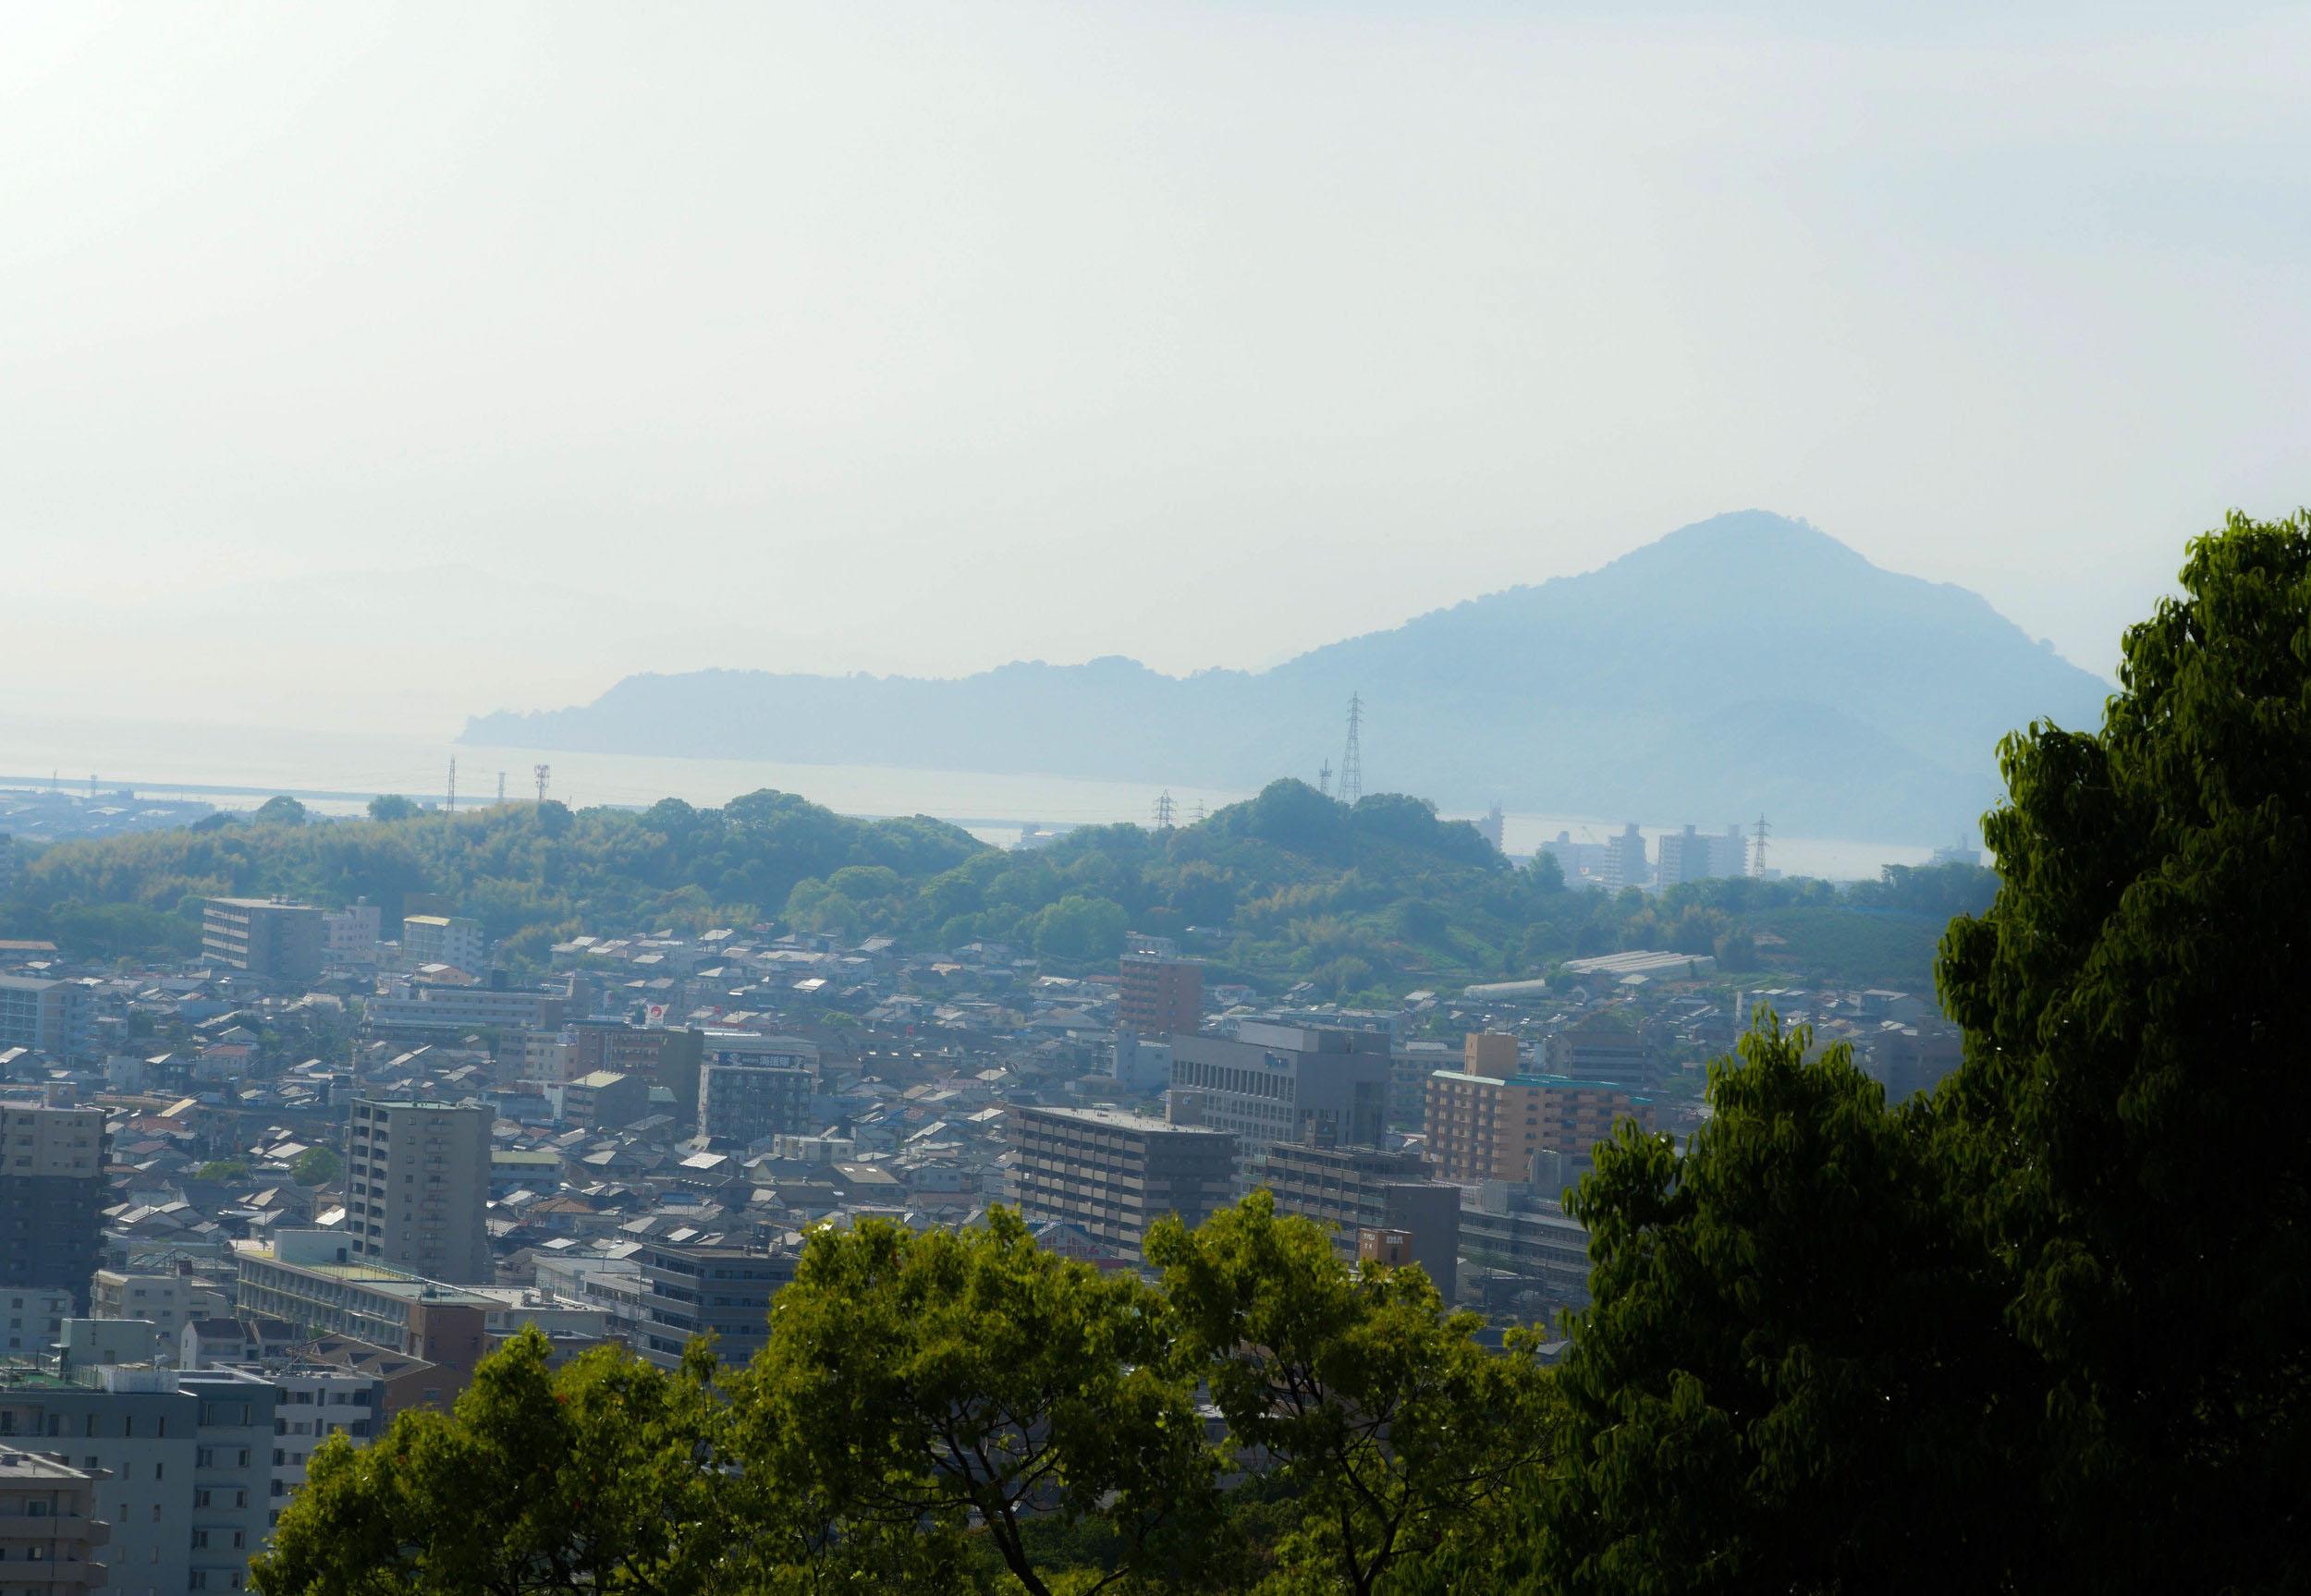 matsuyama-dougo-onsen-11.jpg